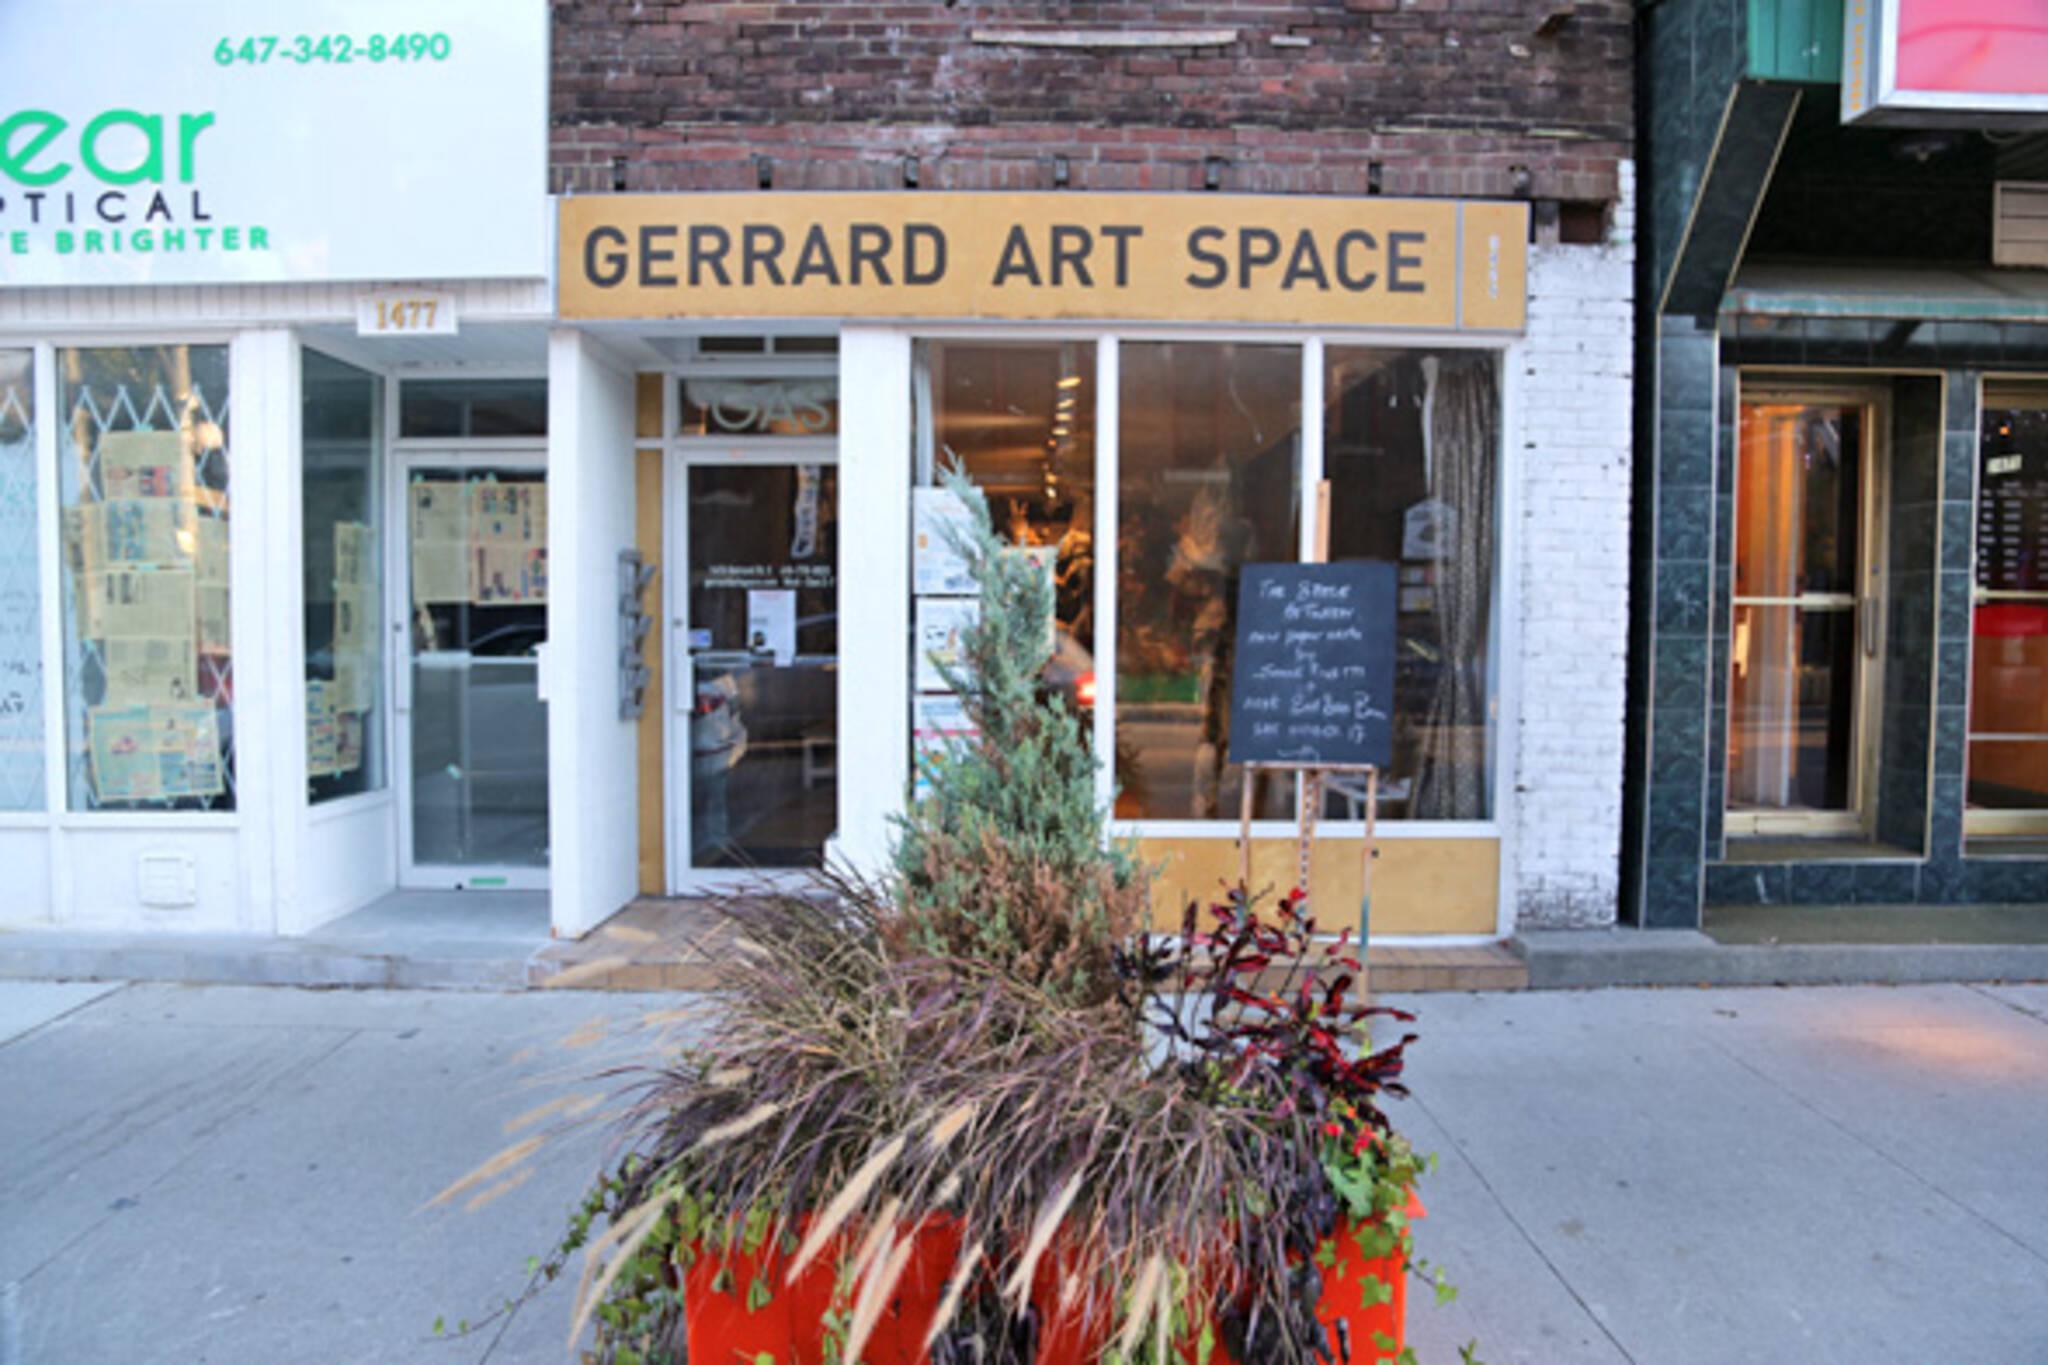 Gerrard Art Space